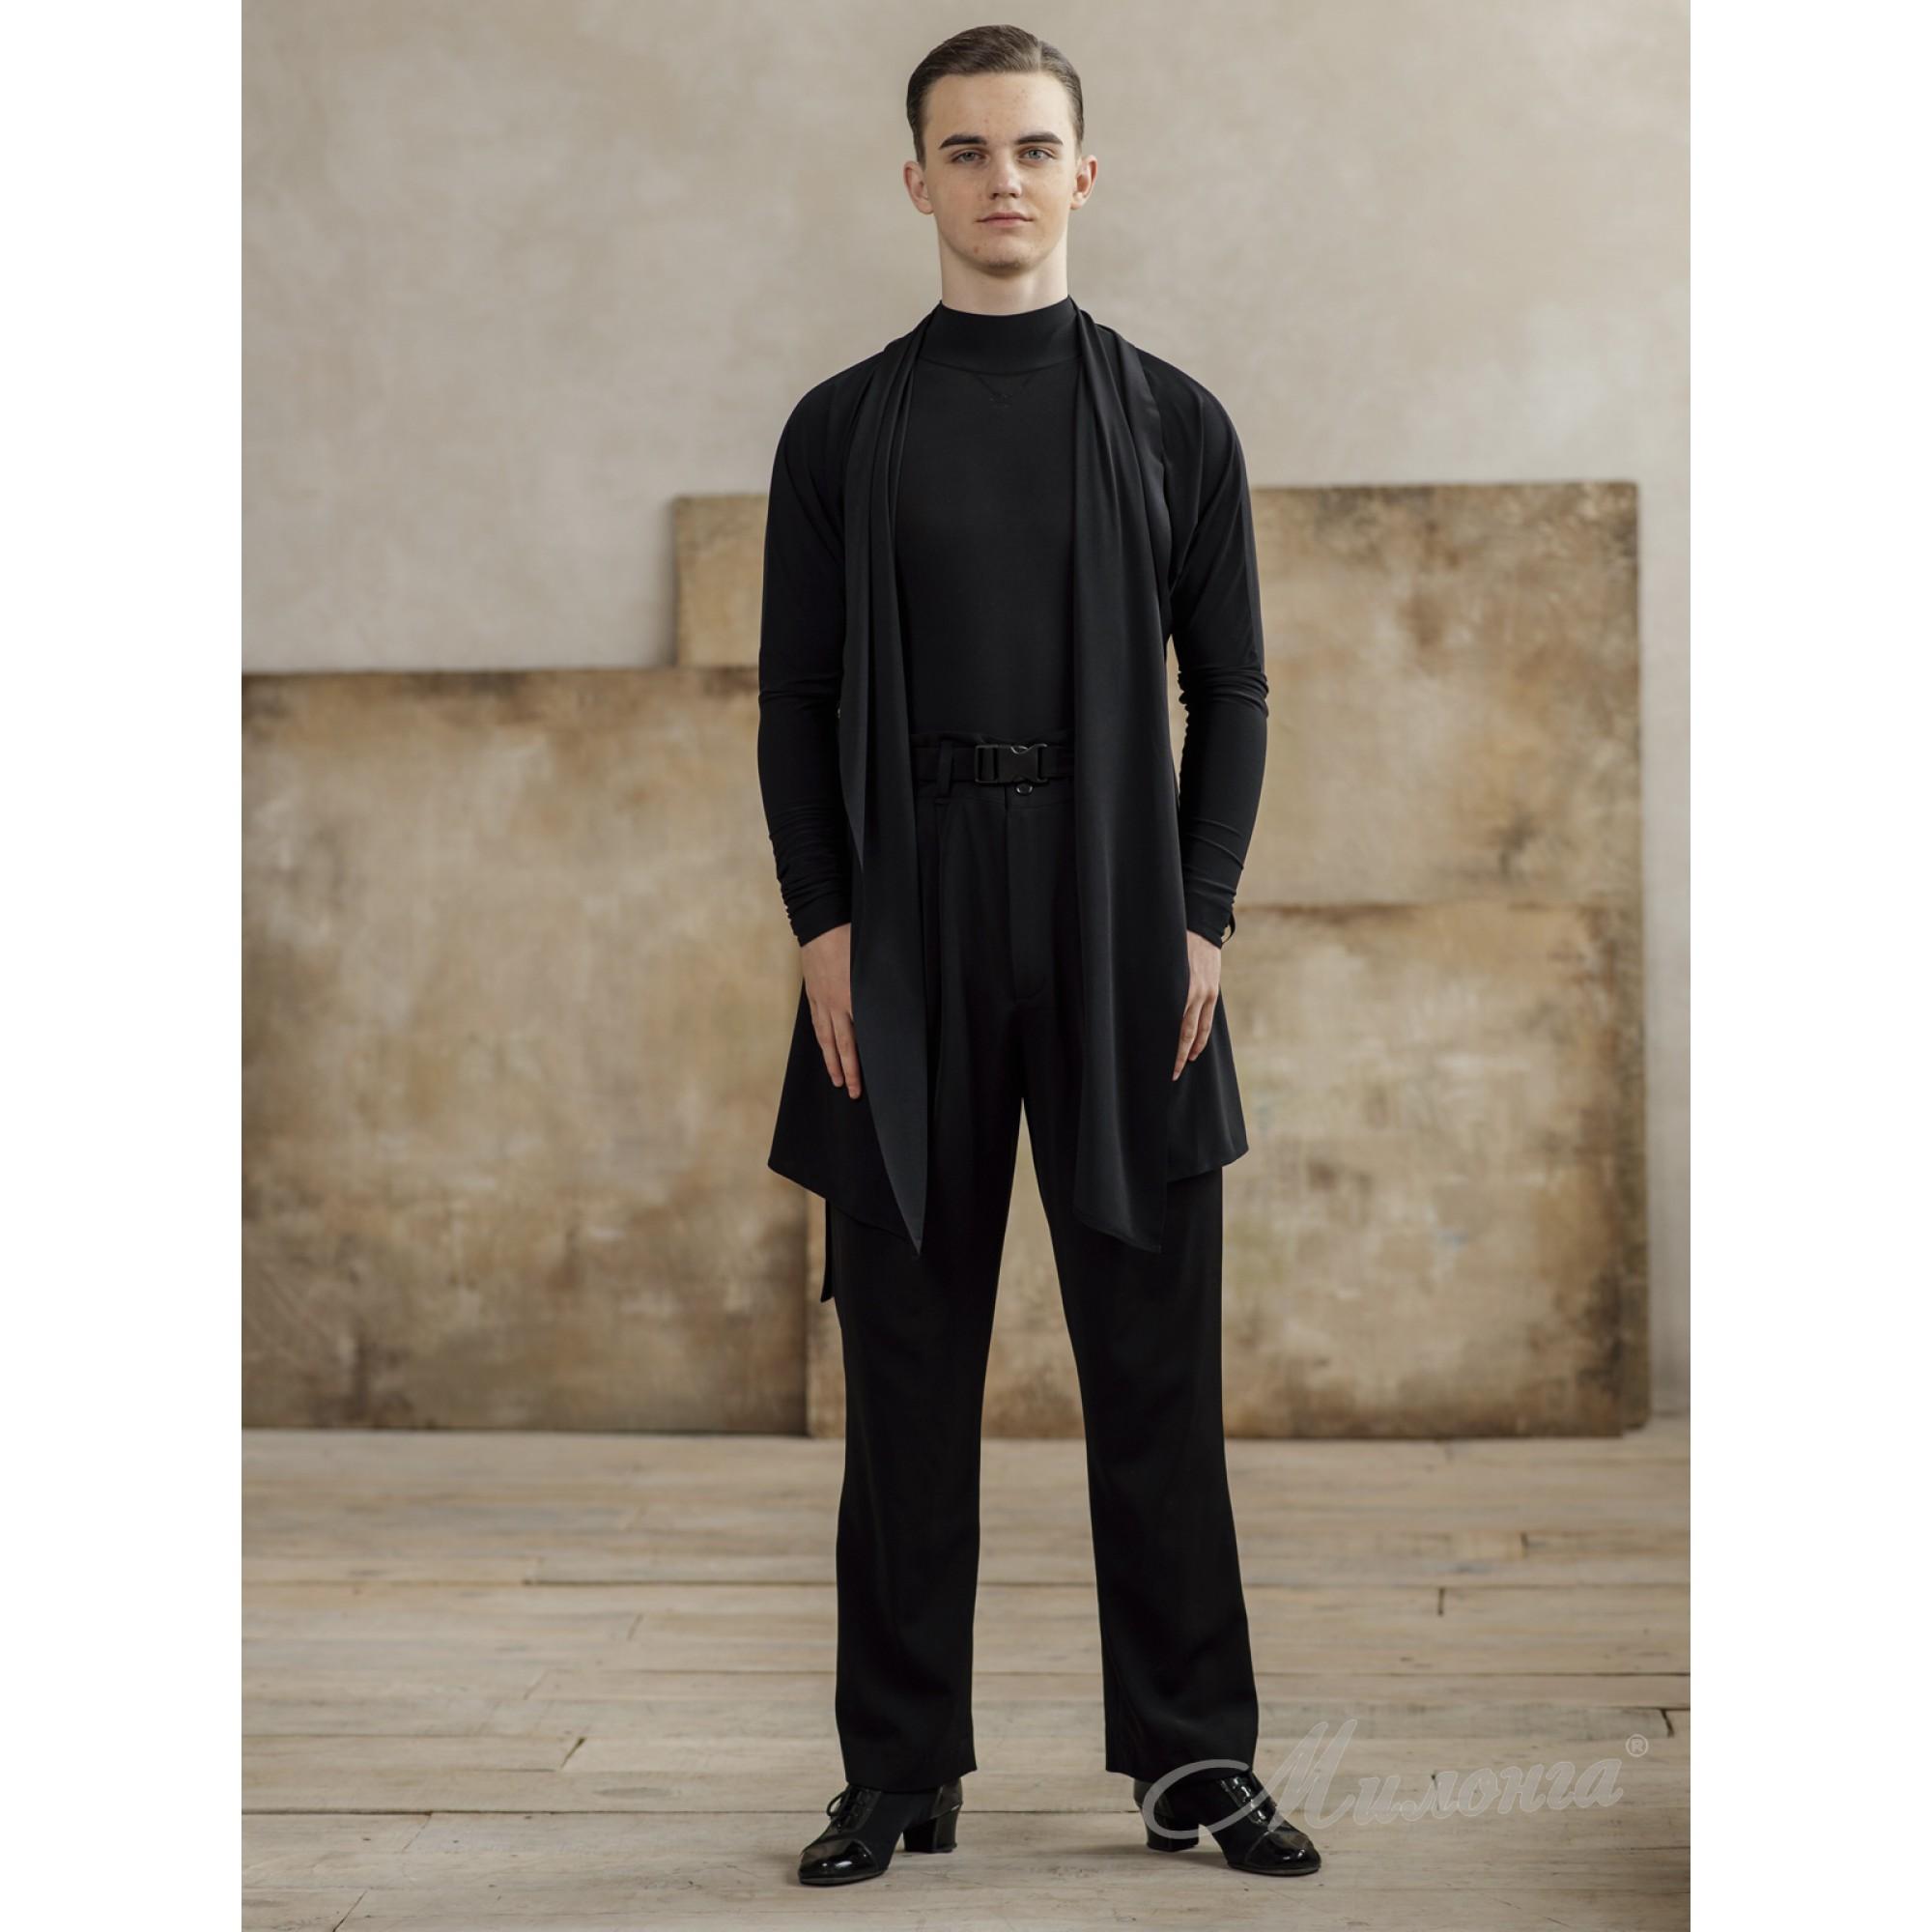 Кардиган FashionDance 014